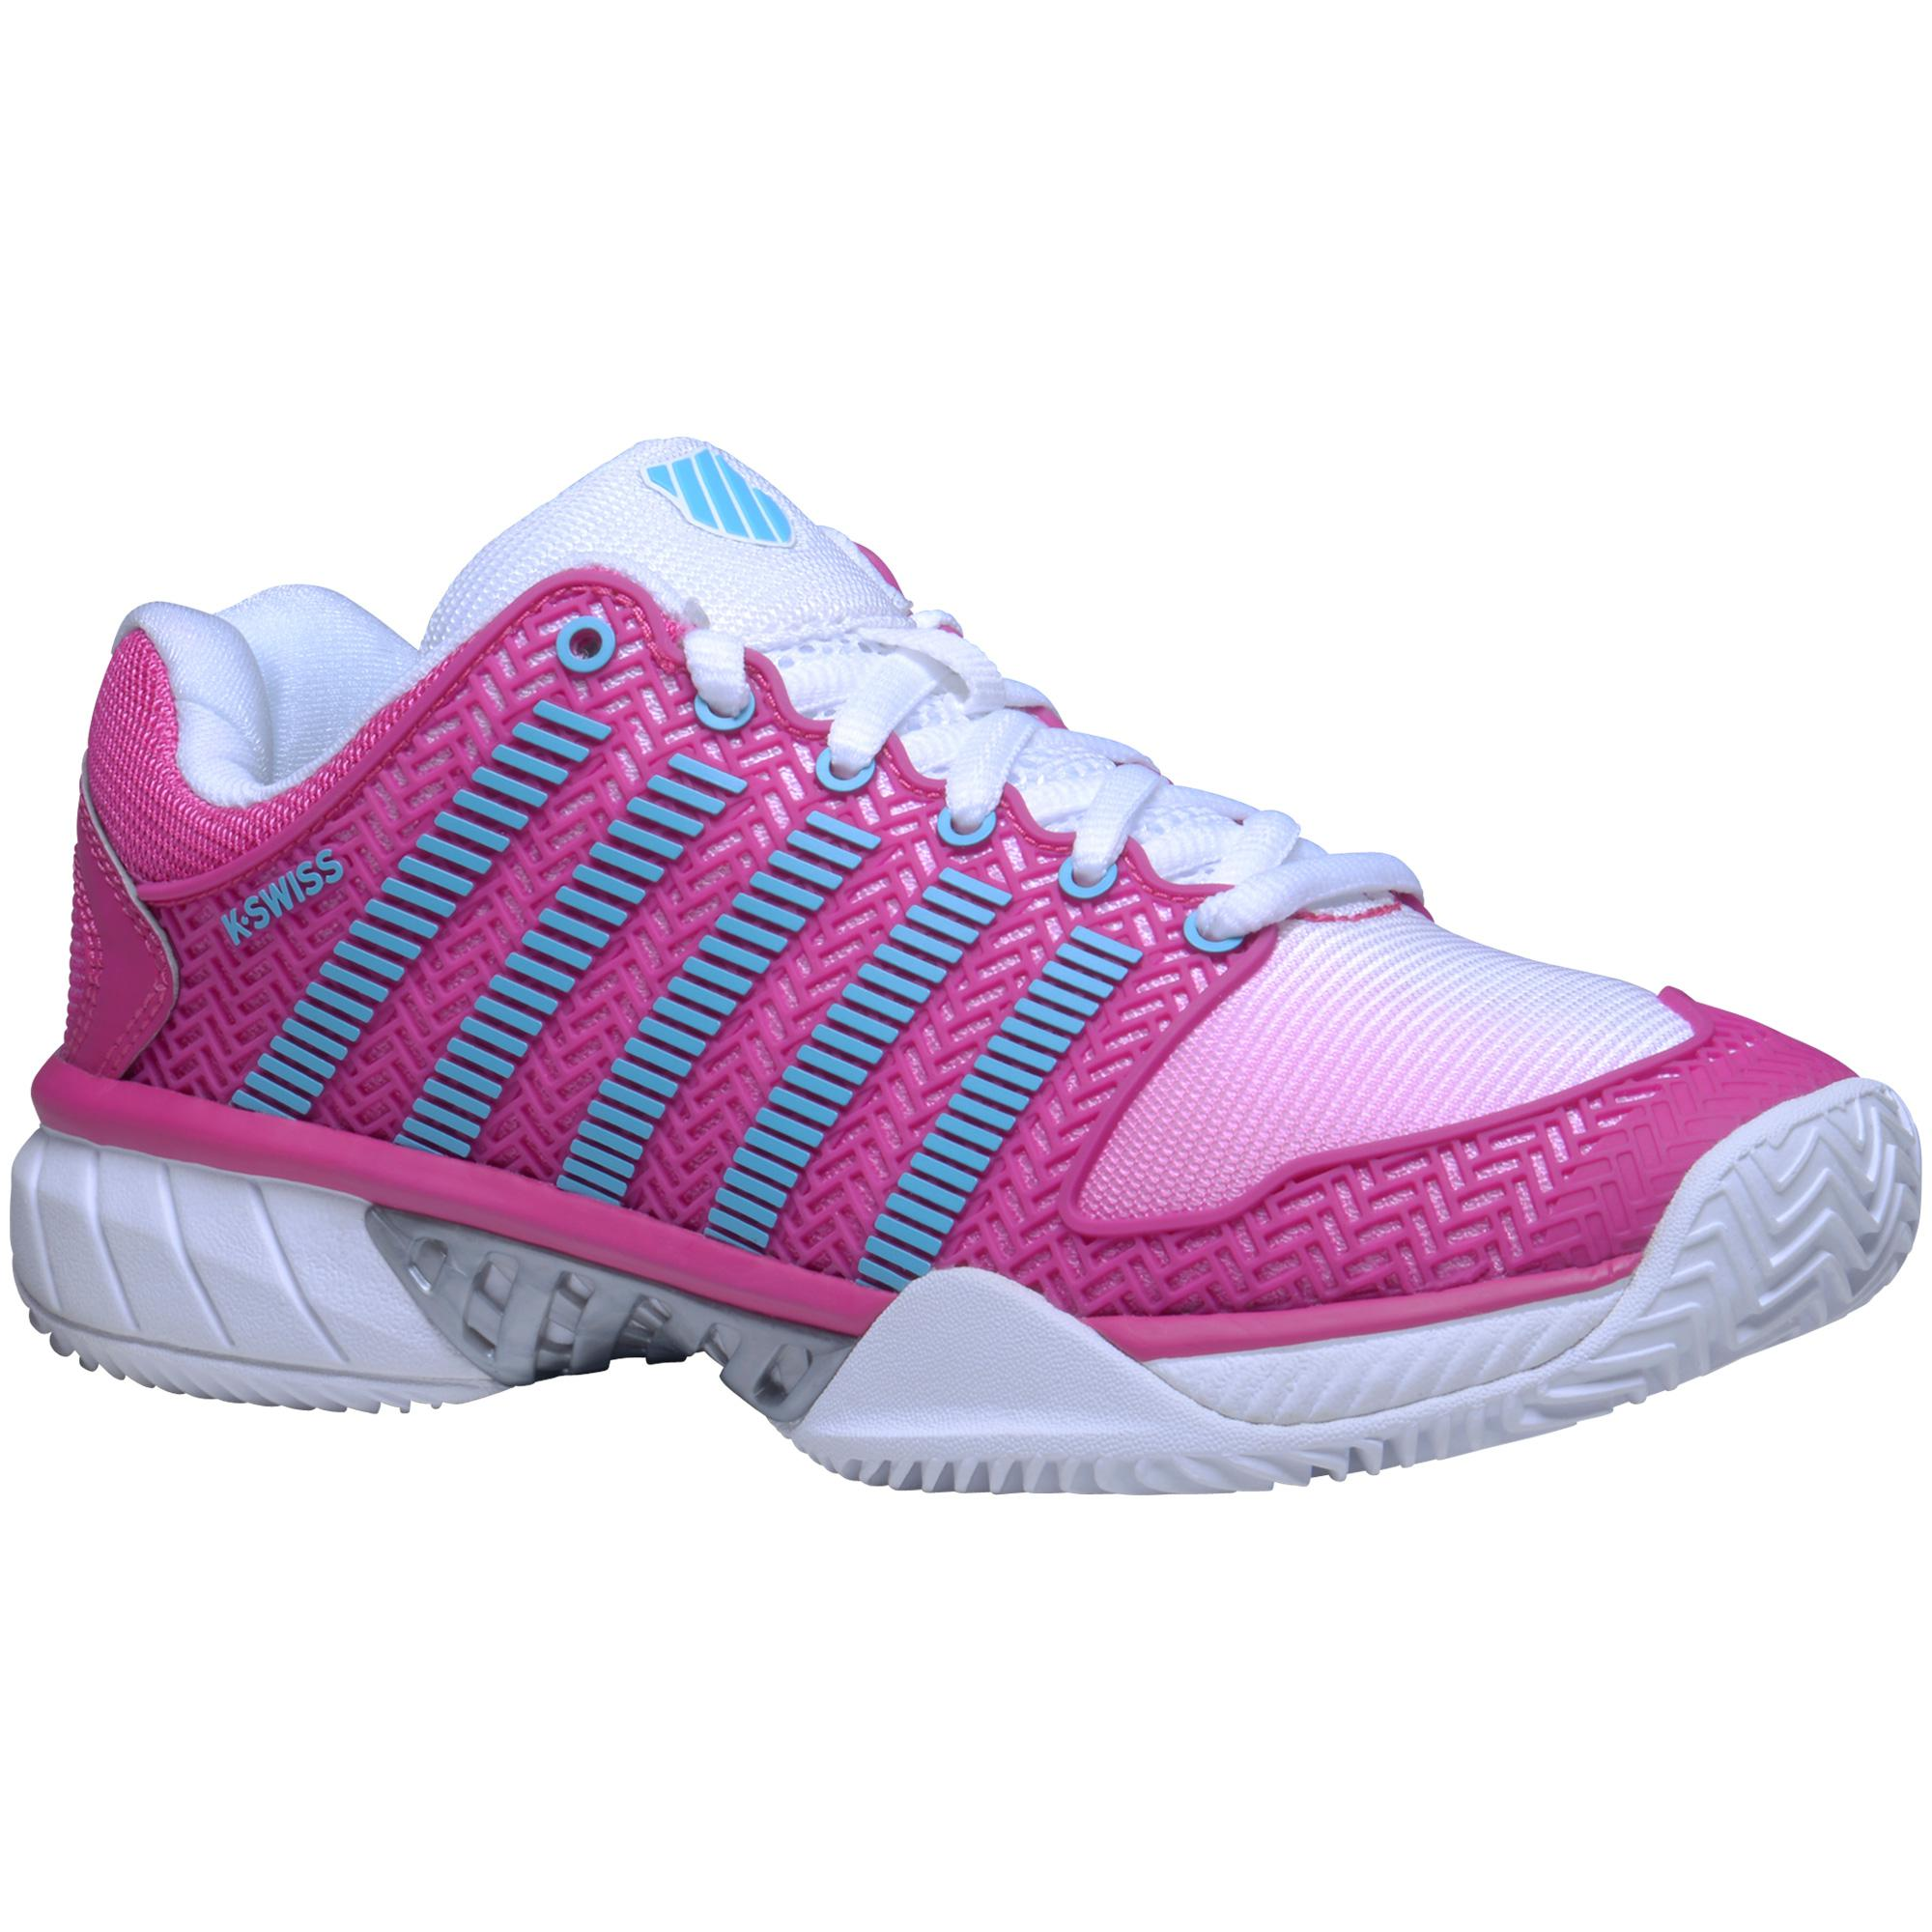 Tennis Express Womens Shoes